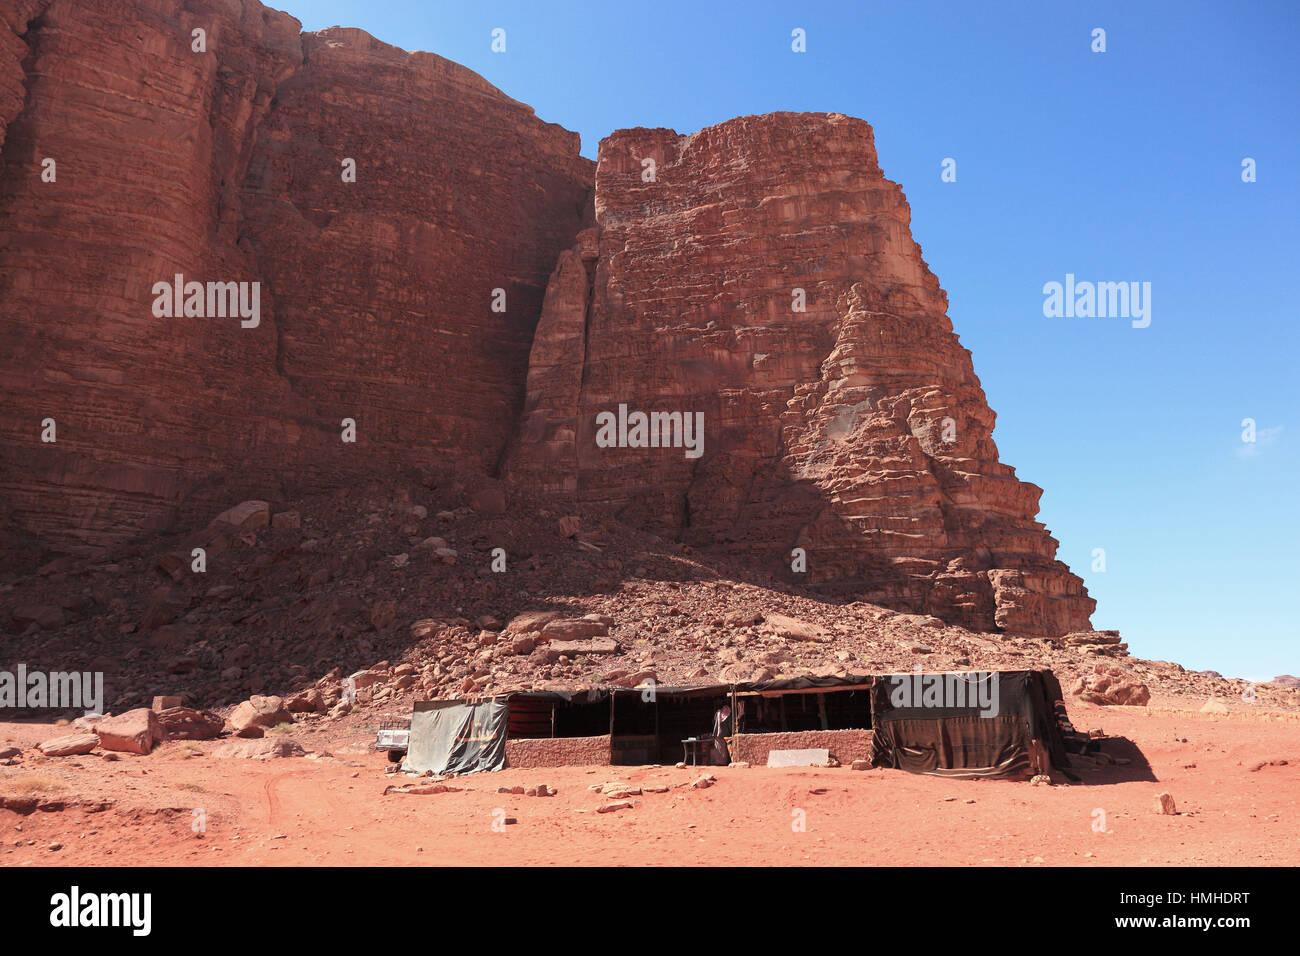 Szene der Wüste Wadi Rum, Jordanien Stockfoto